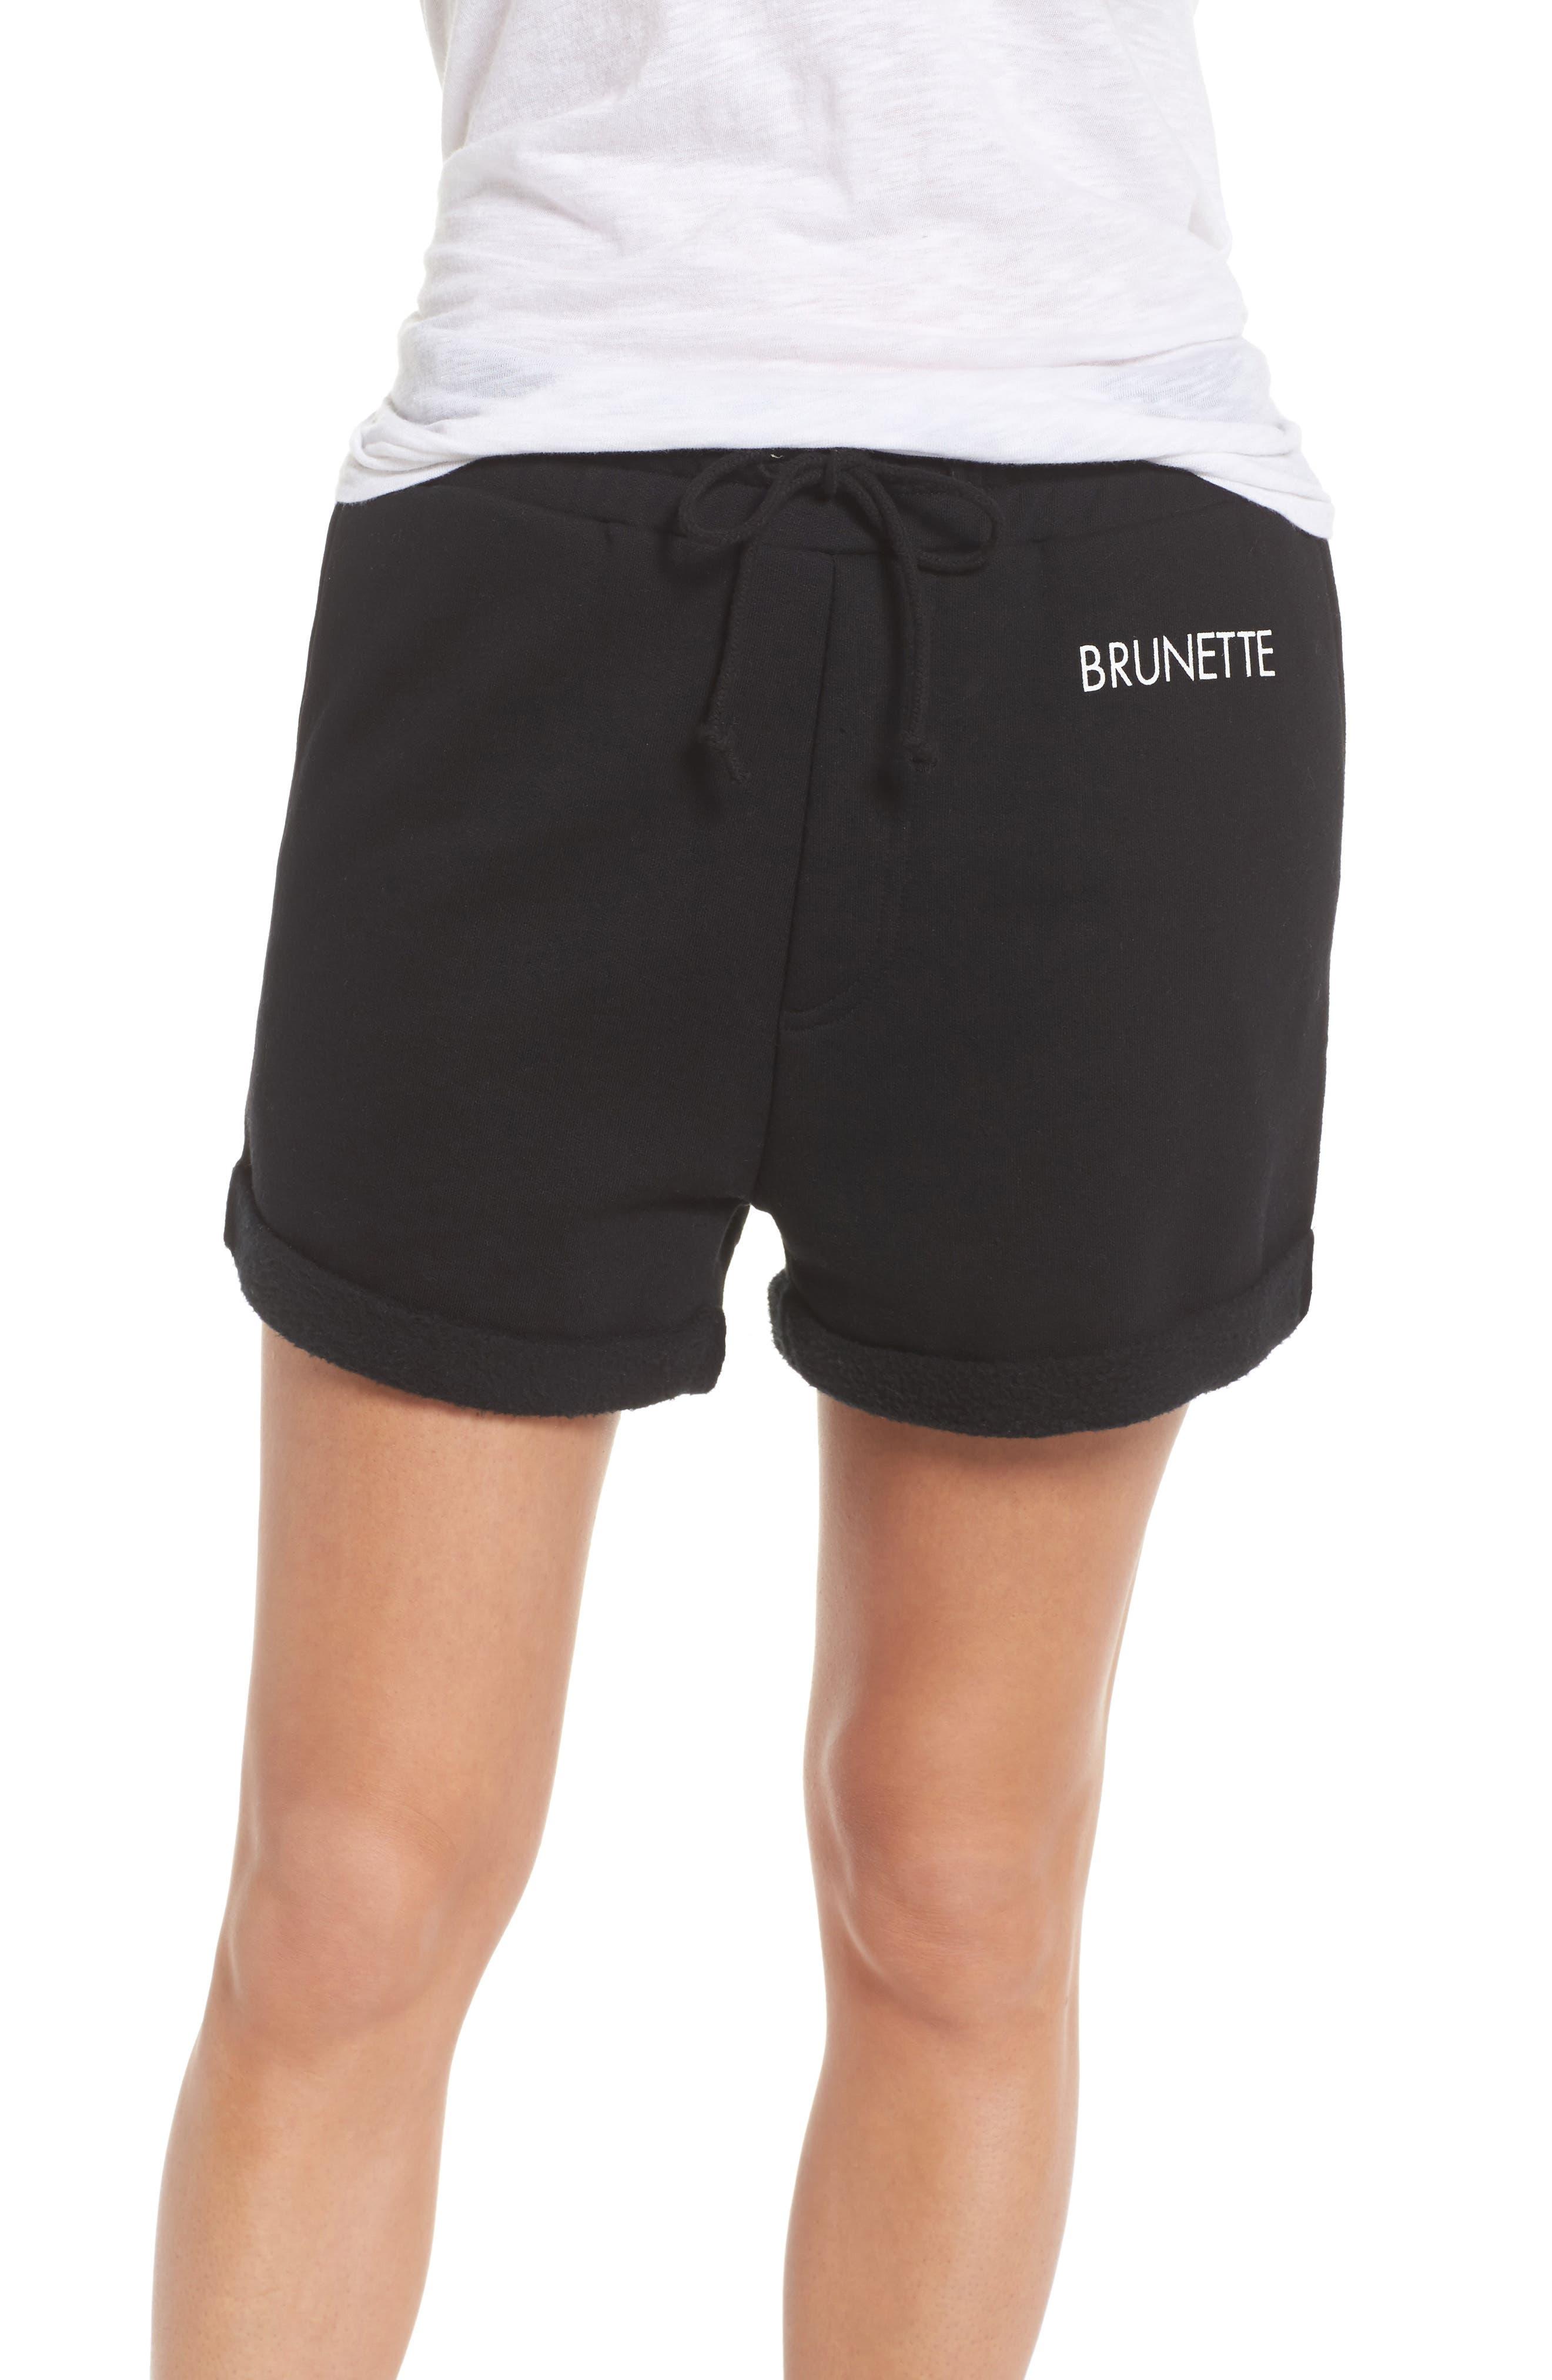 Brunette Shorts,                         Main,                         color, Black